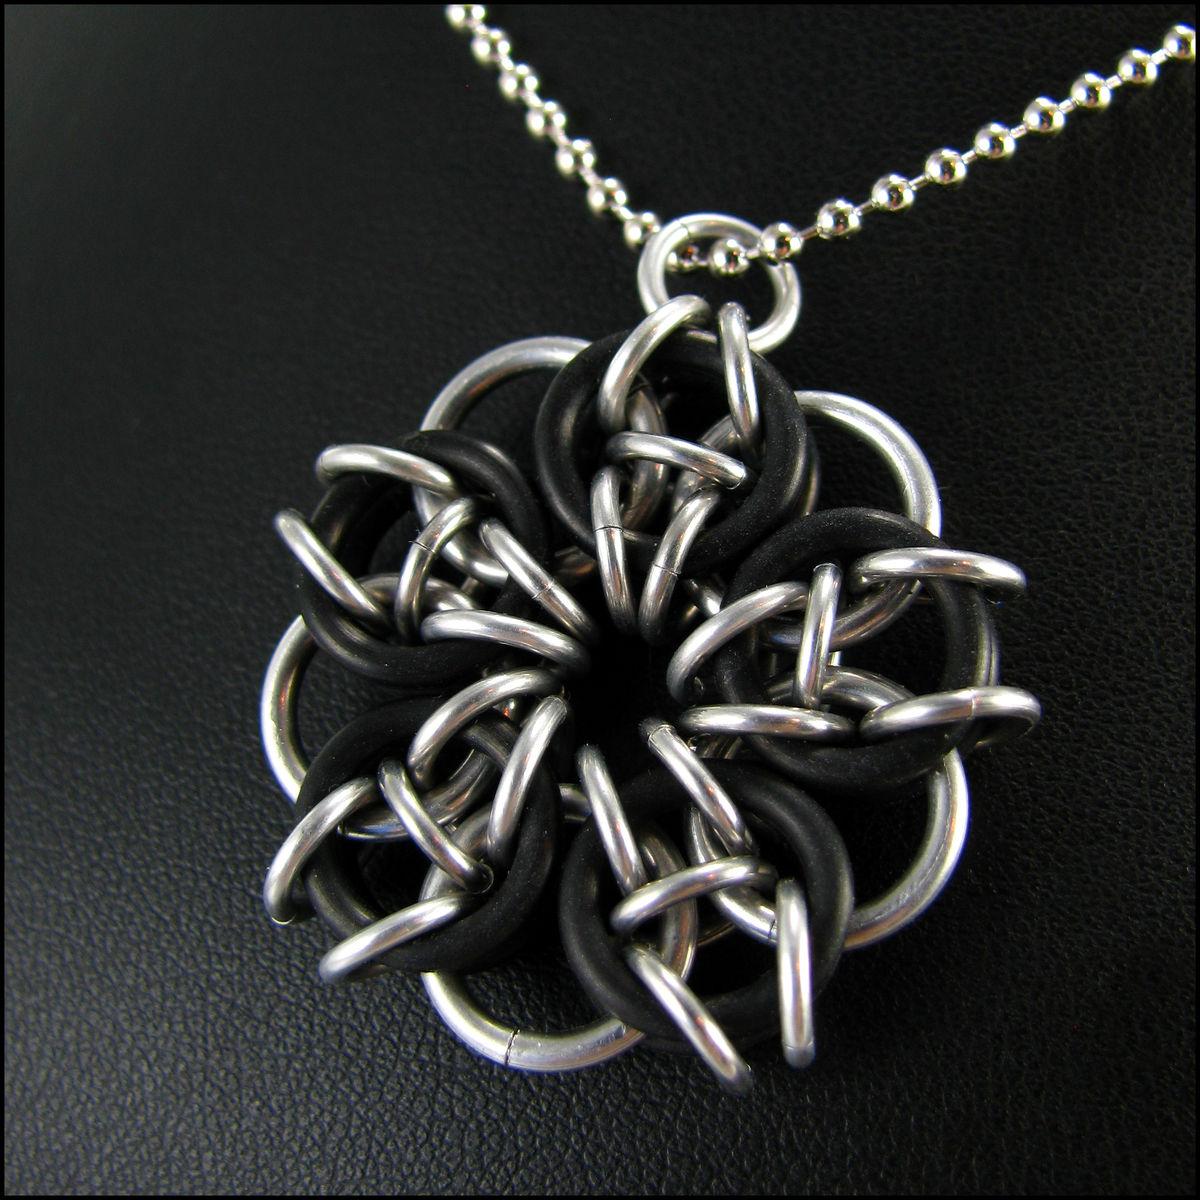 Handmade Pendant Jewelry Handmade Chainmaille Pendant